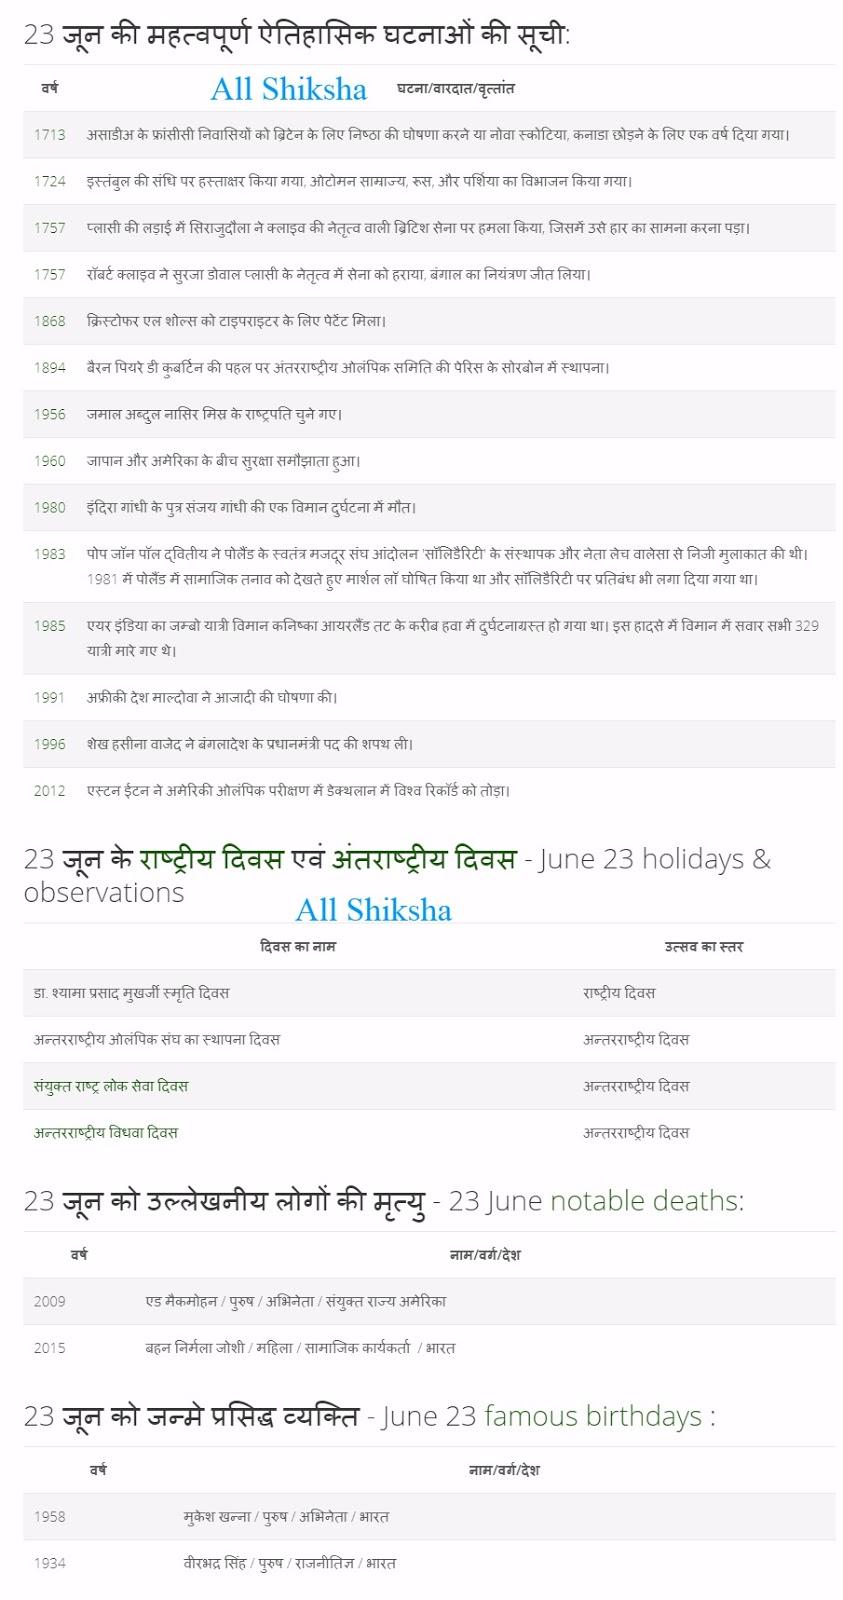 History of 23 June